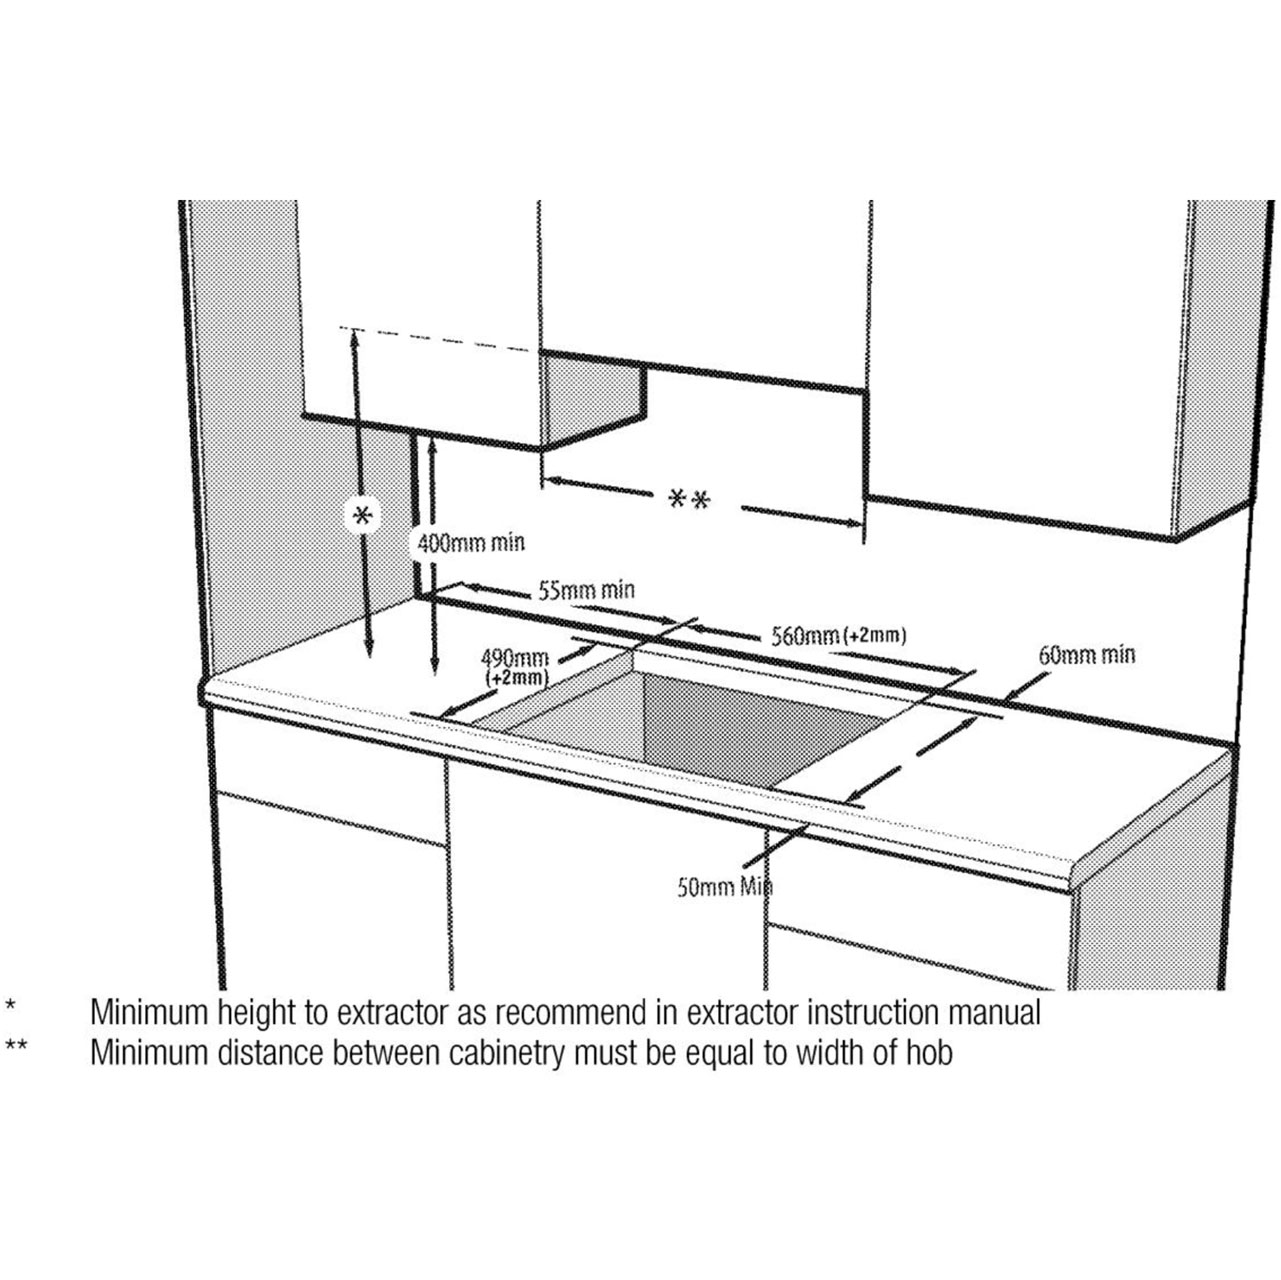 Beko Washing Machine Motor Wiring Diagram Great Design Of Washer Jeffdoedesign Com Samsung Dryer Whirlpool